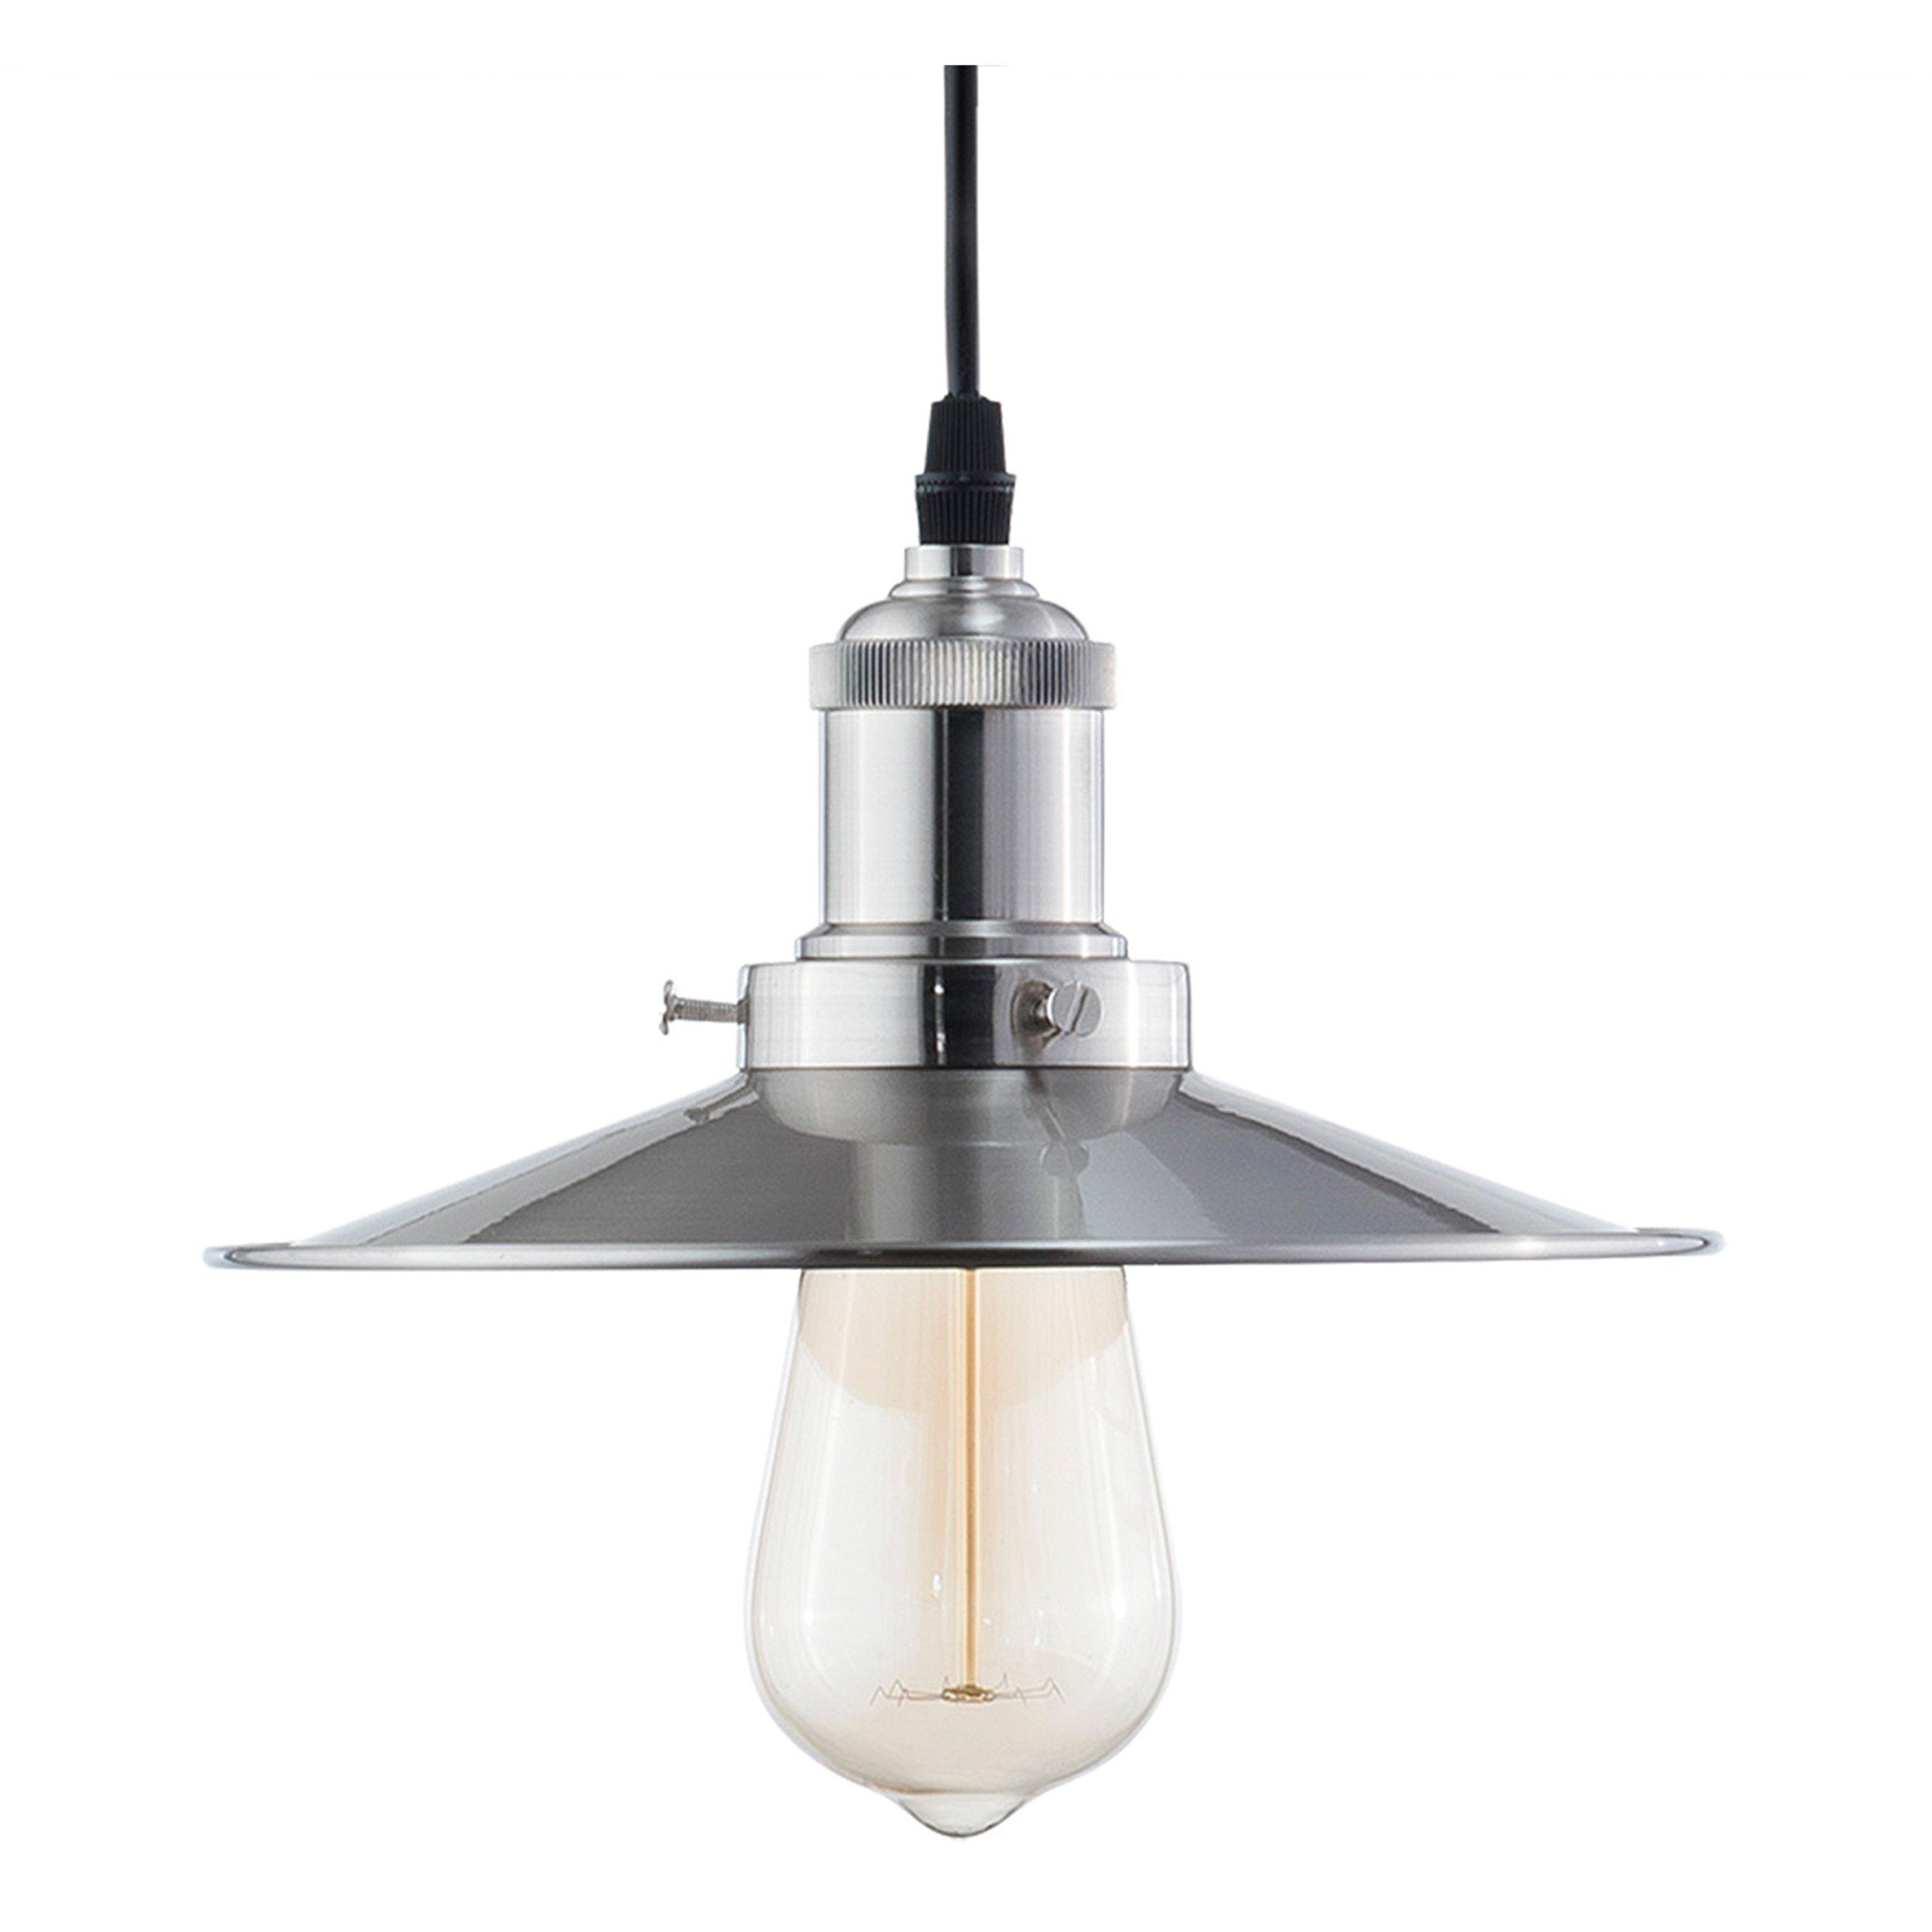 Light Society Avenue Mini Pendant Light, Brushed Nickel, Vintage Modern Industrial Lighting Fixture (LS-C173)